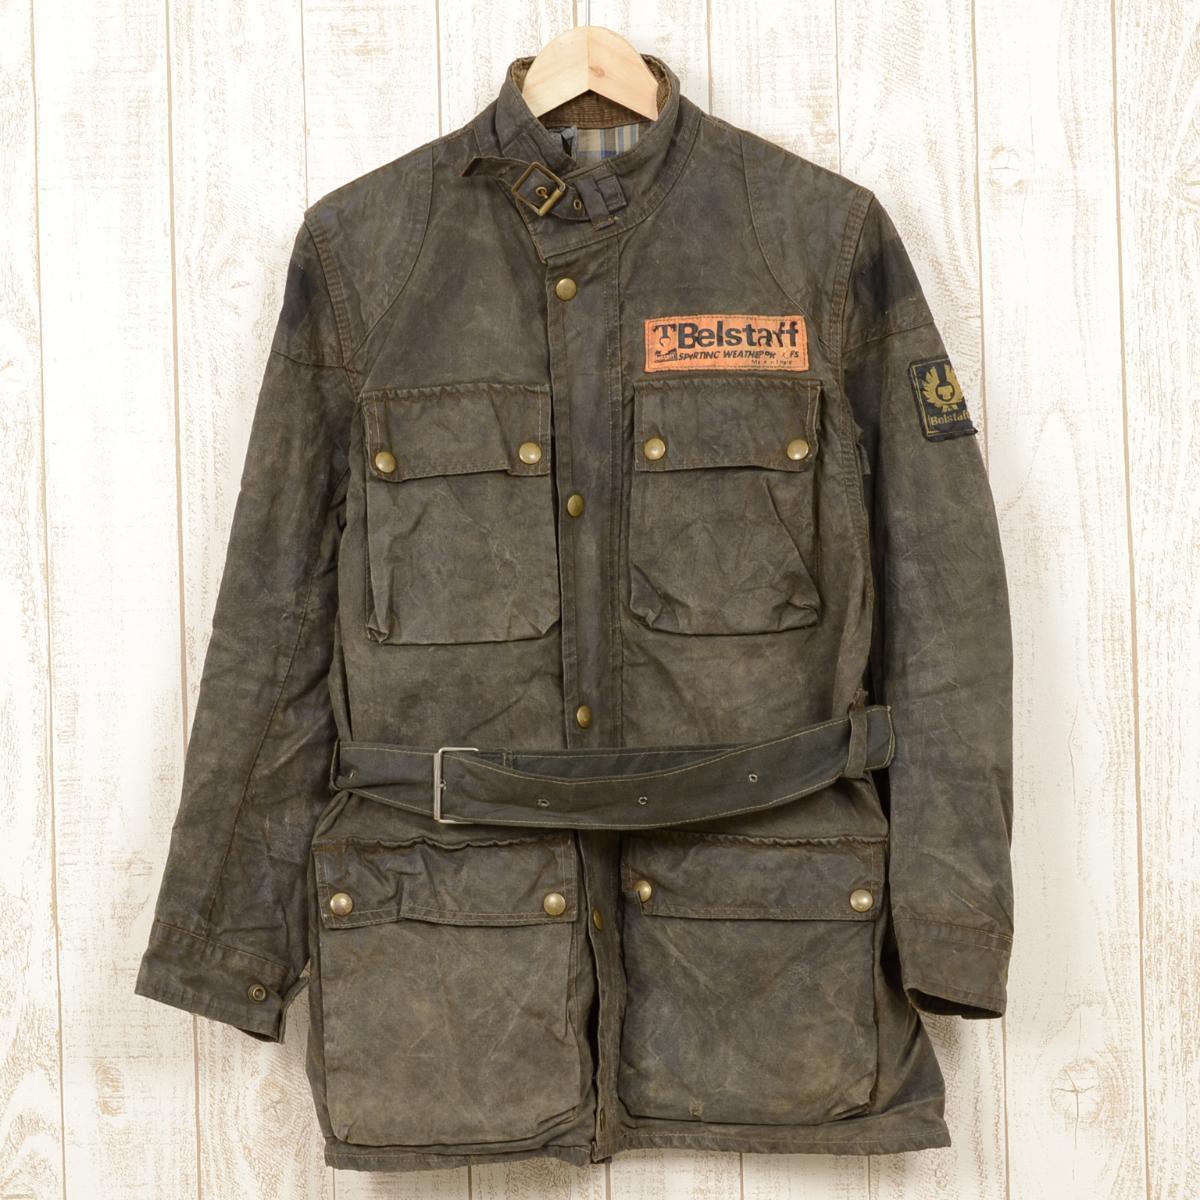 Belstaff Trialmaster Jacket Ebay